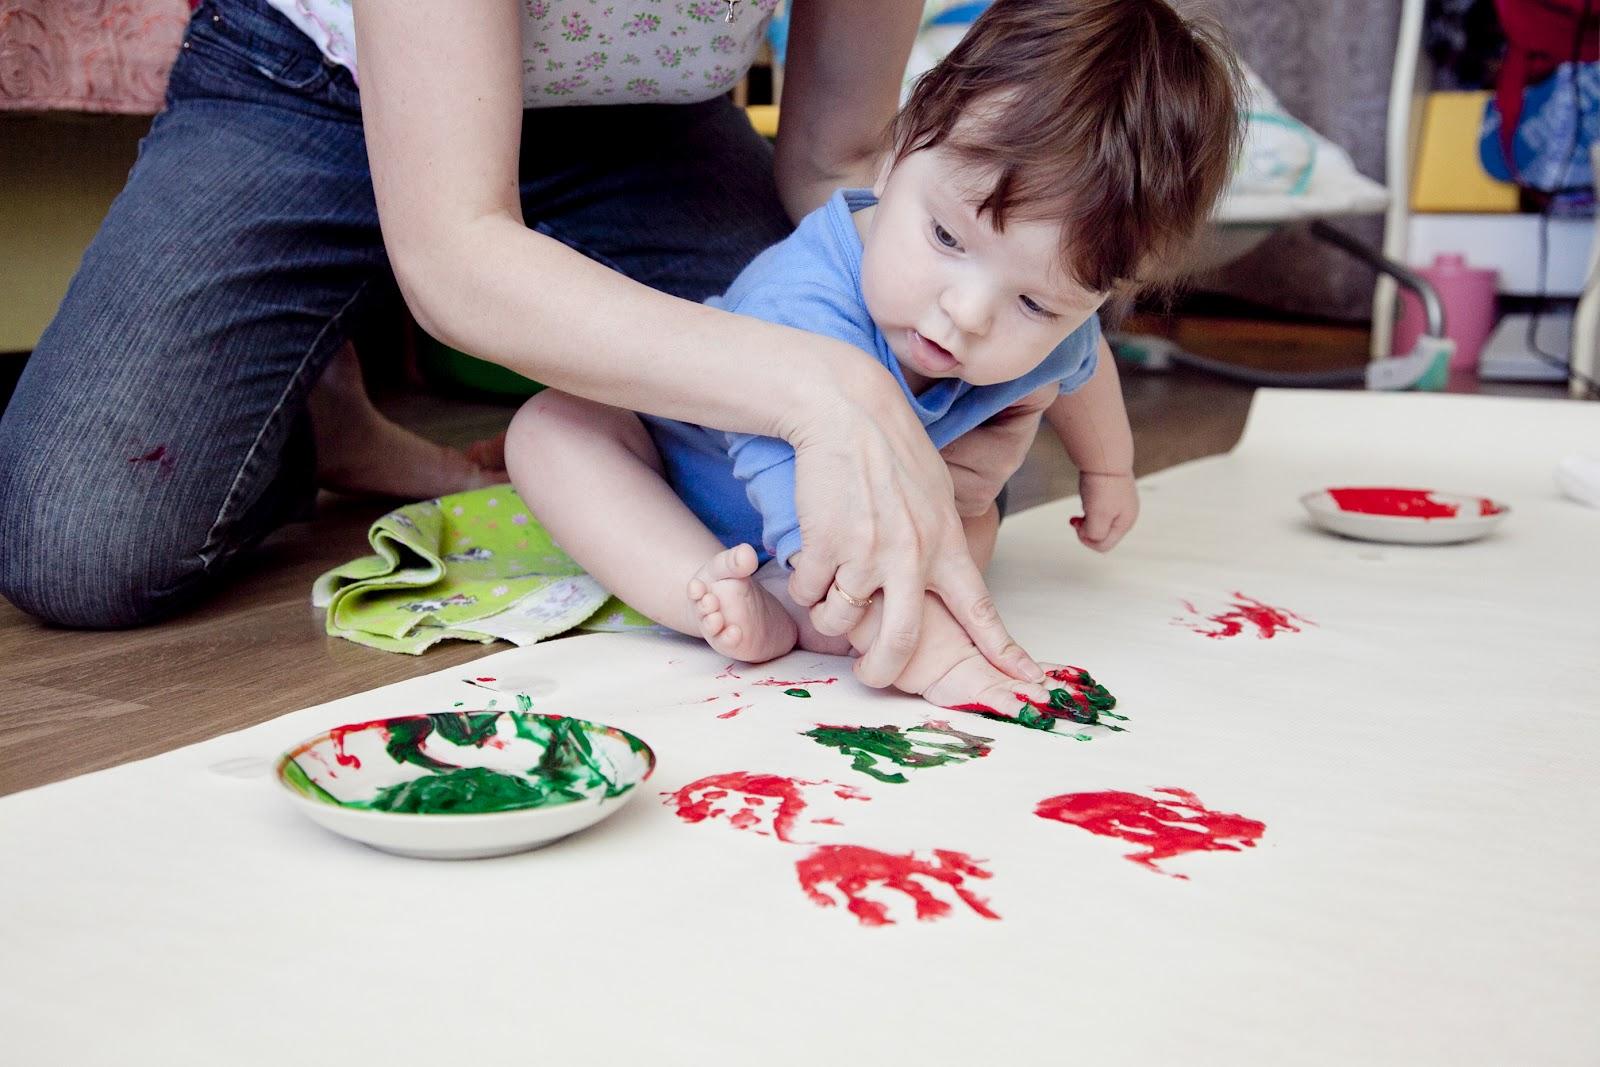 Рисуем своими руками дети 7